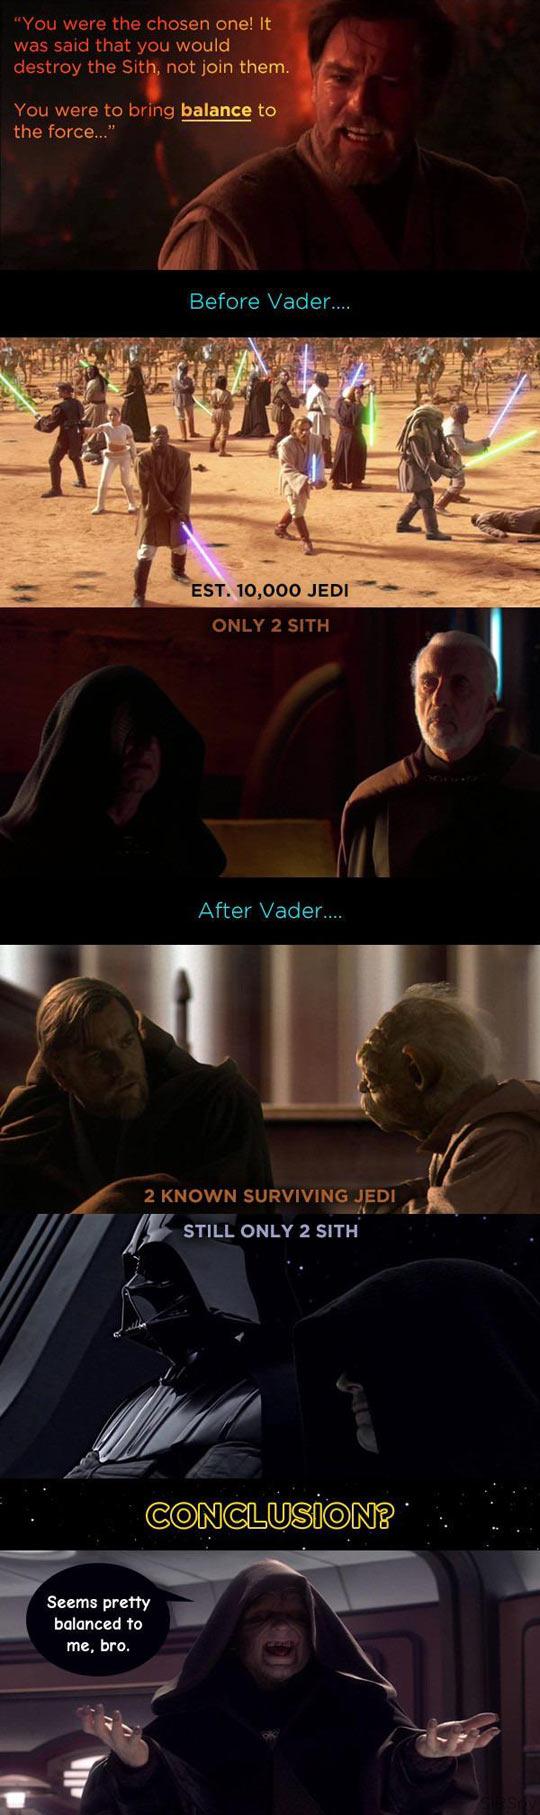 funny-balance-force-Star-Wars